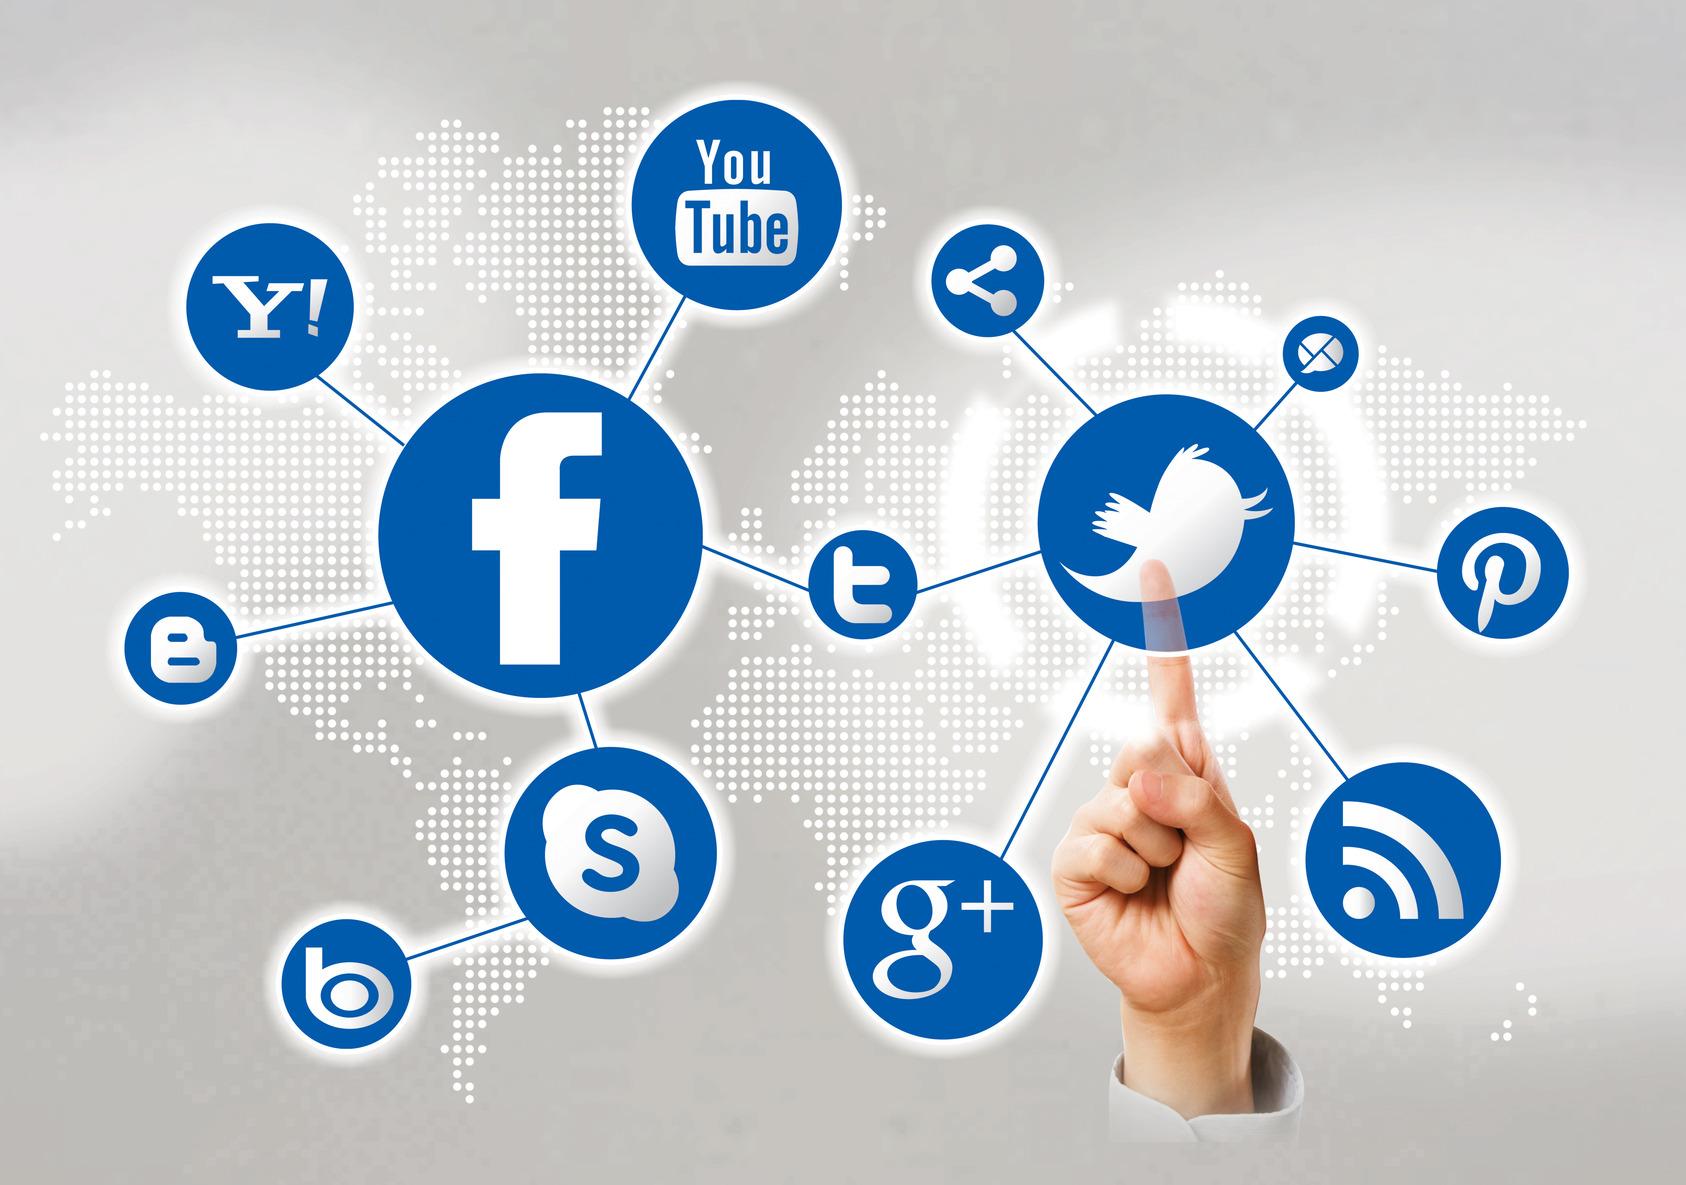 Social Media Touch HD ForWallpaperscom 3939 Wallpaper 1686x1185